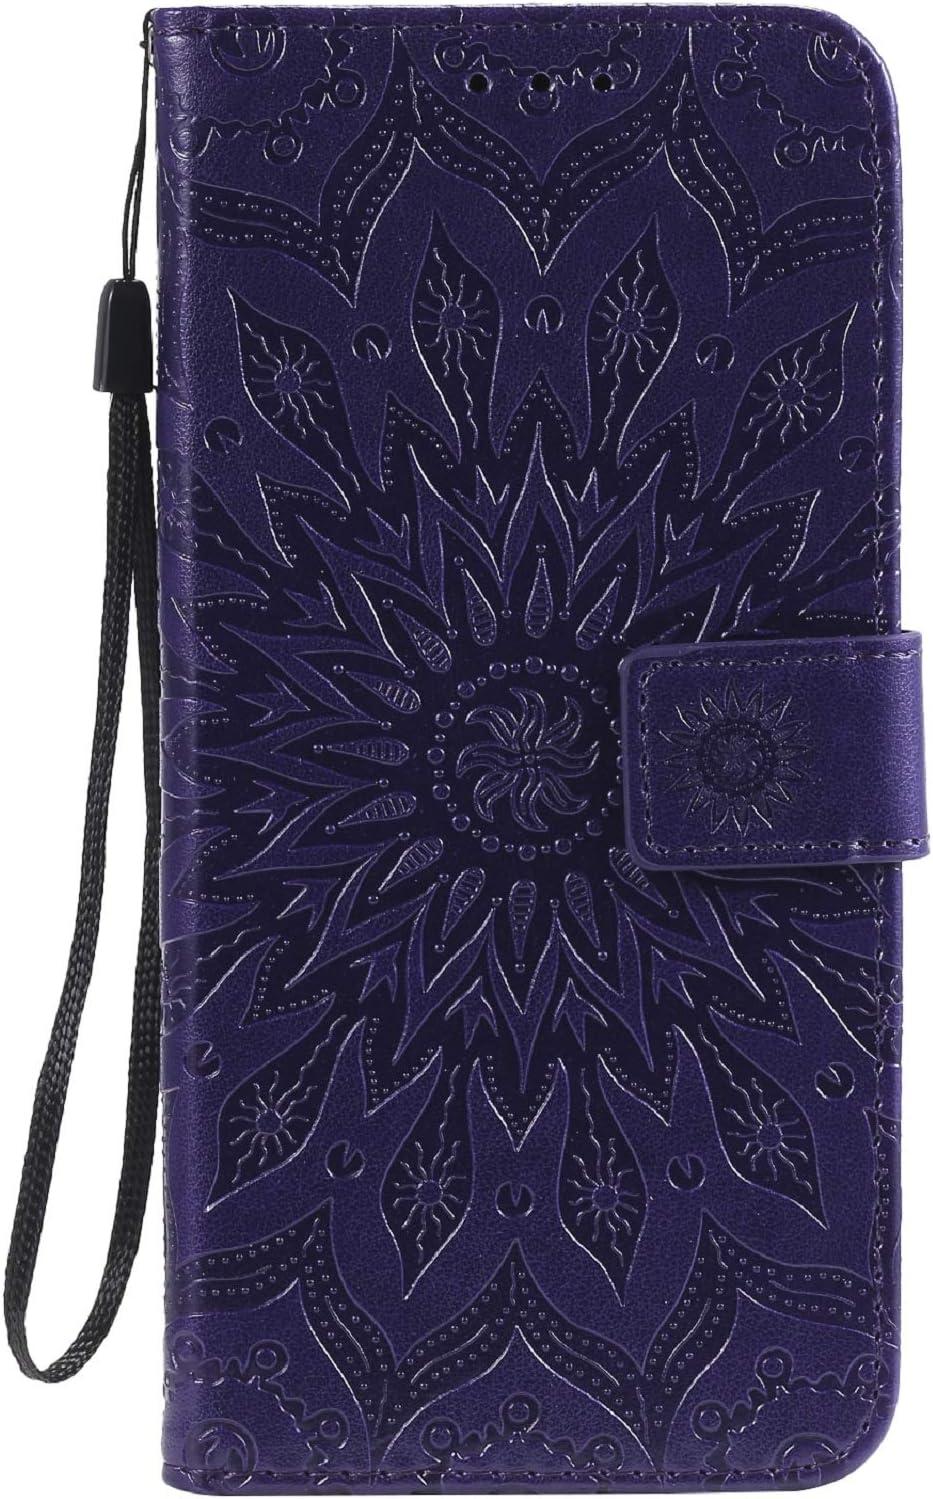 Cfrau Kickstand Wallet Case with Samsung for Galaxy Stylus Trust Alternative dealer Black